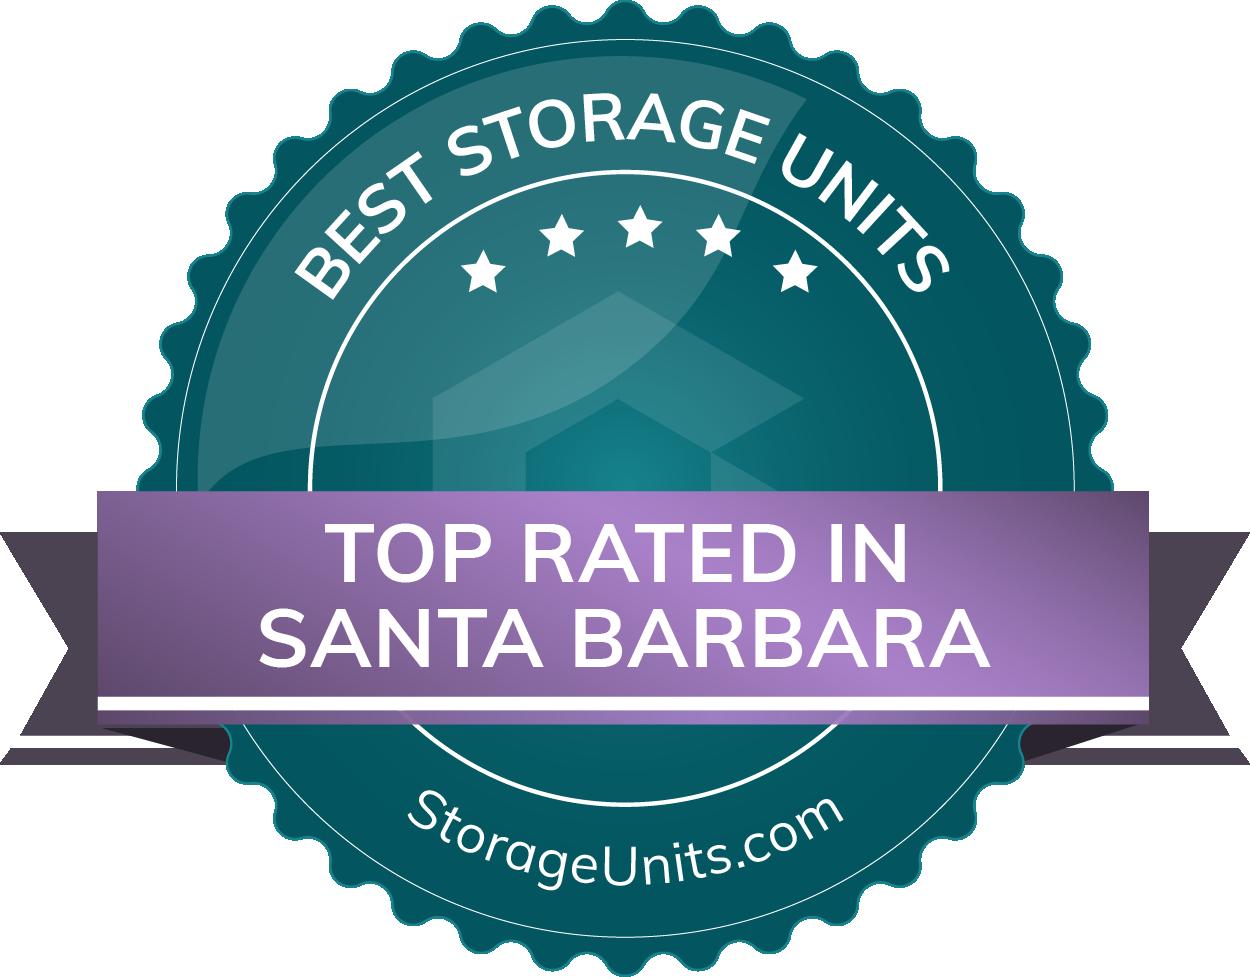 Best Self Storage Units in Santa Barbara, CA